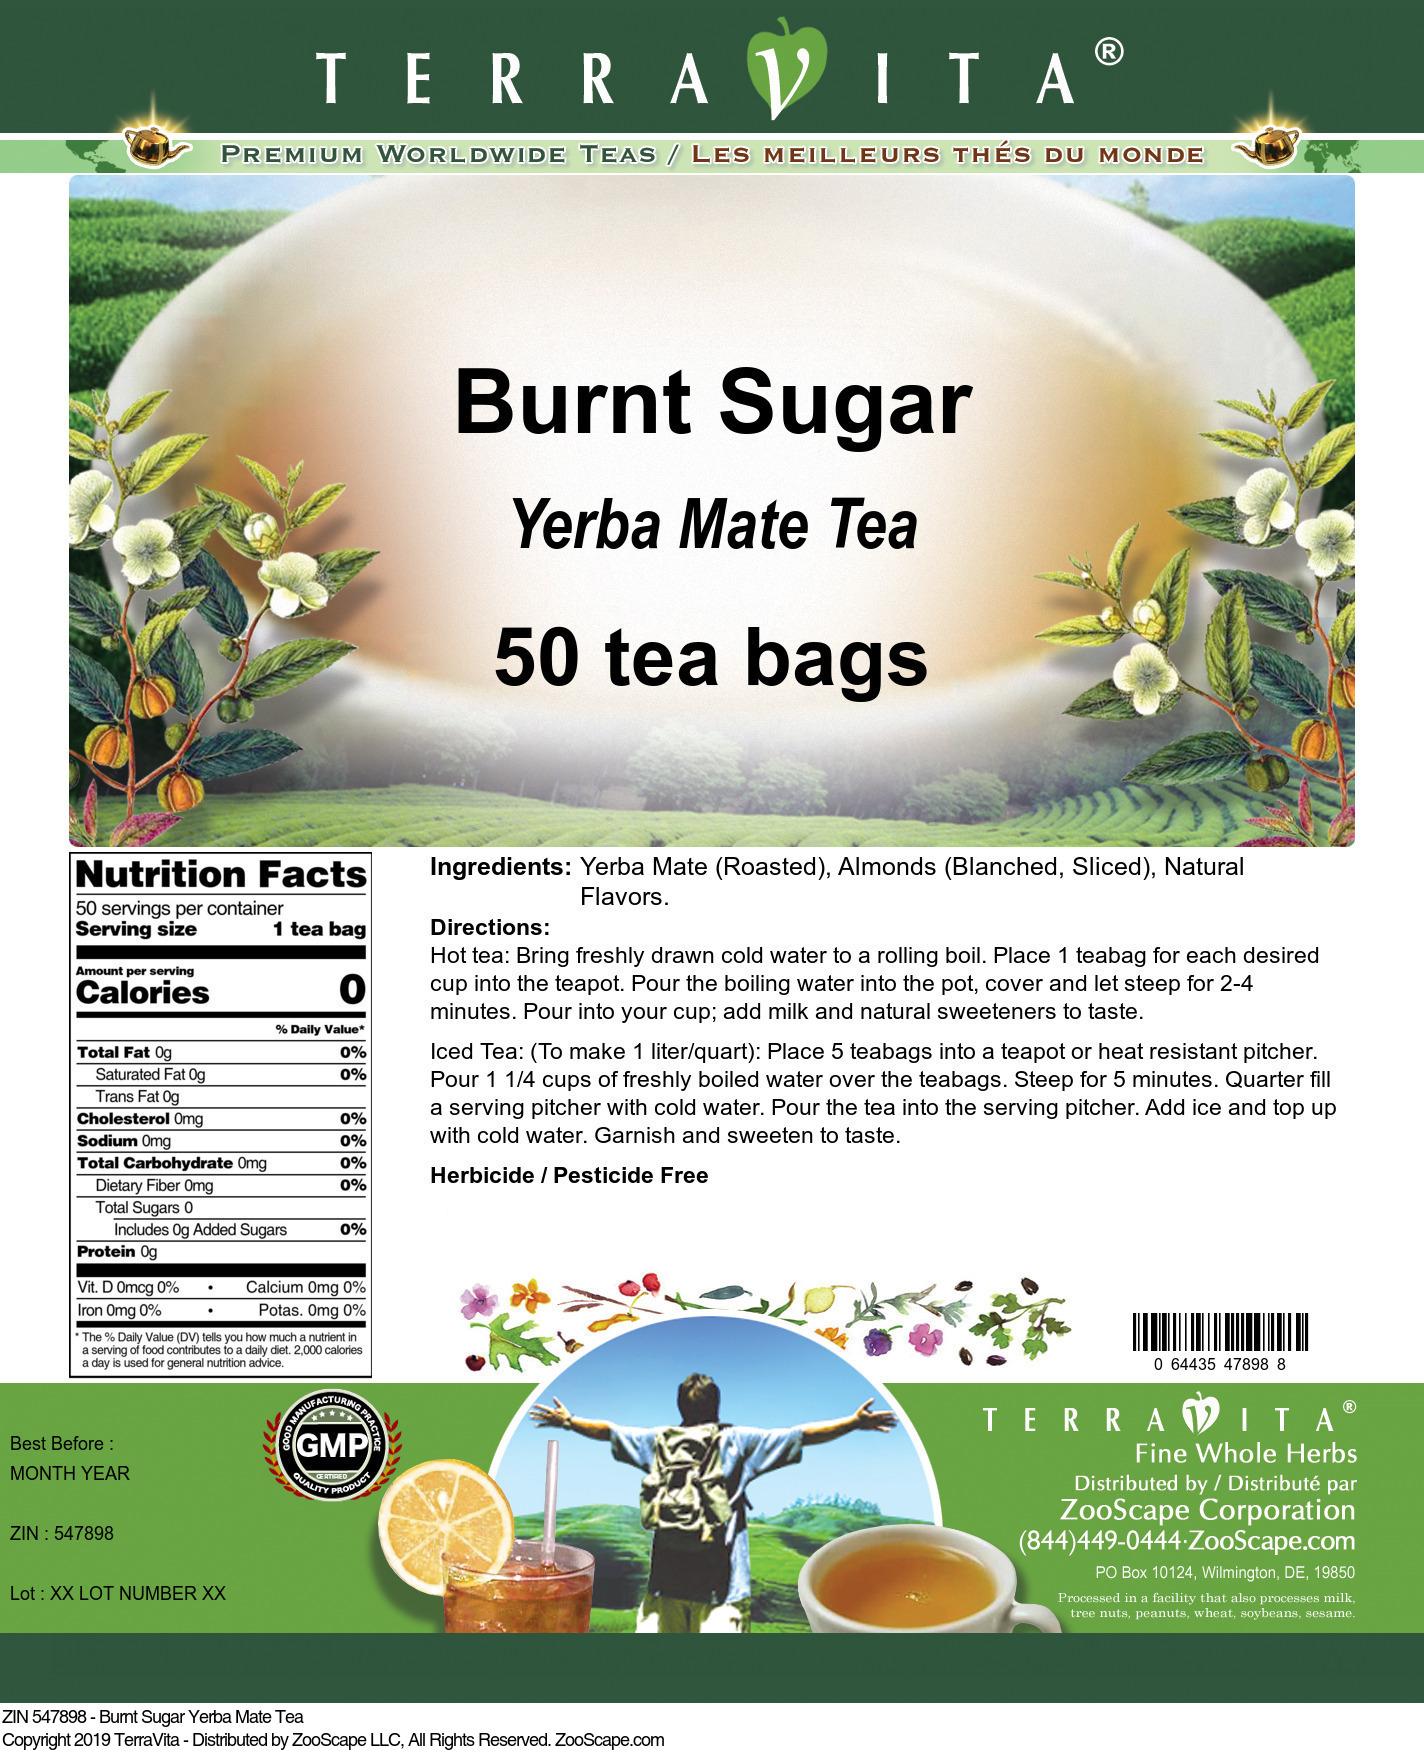 Burnt Sugar Yerba Mate Tea